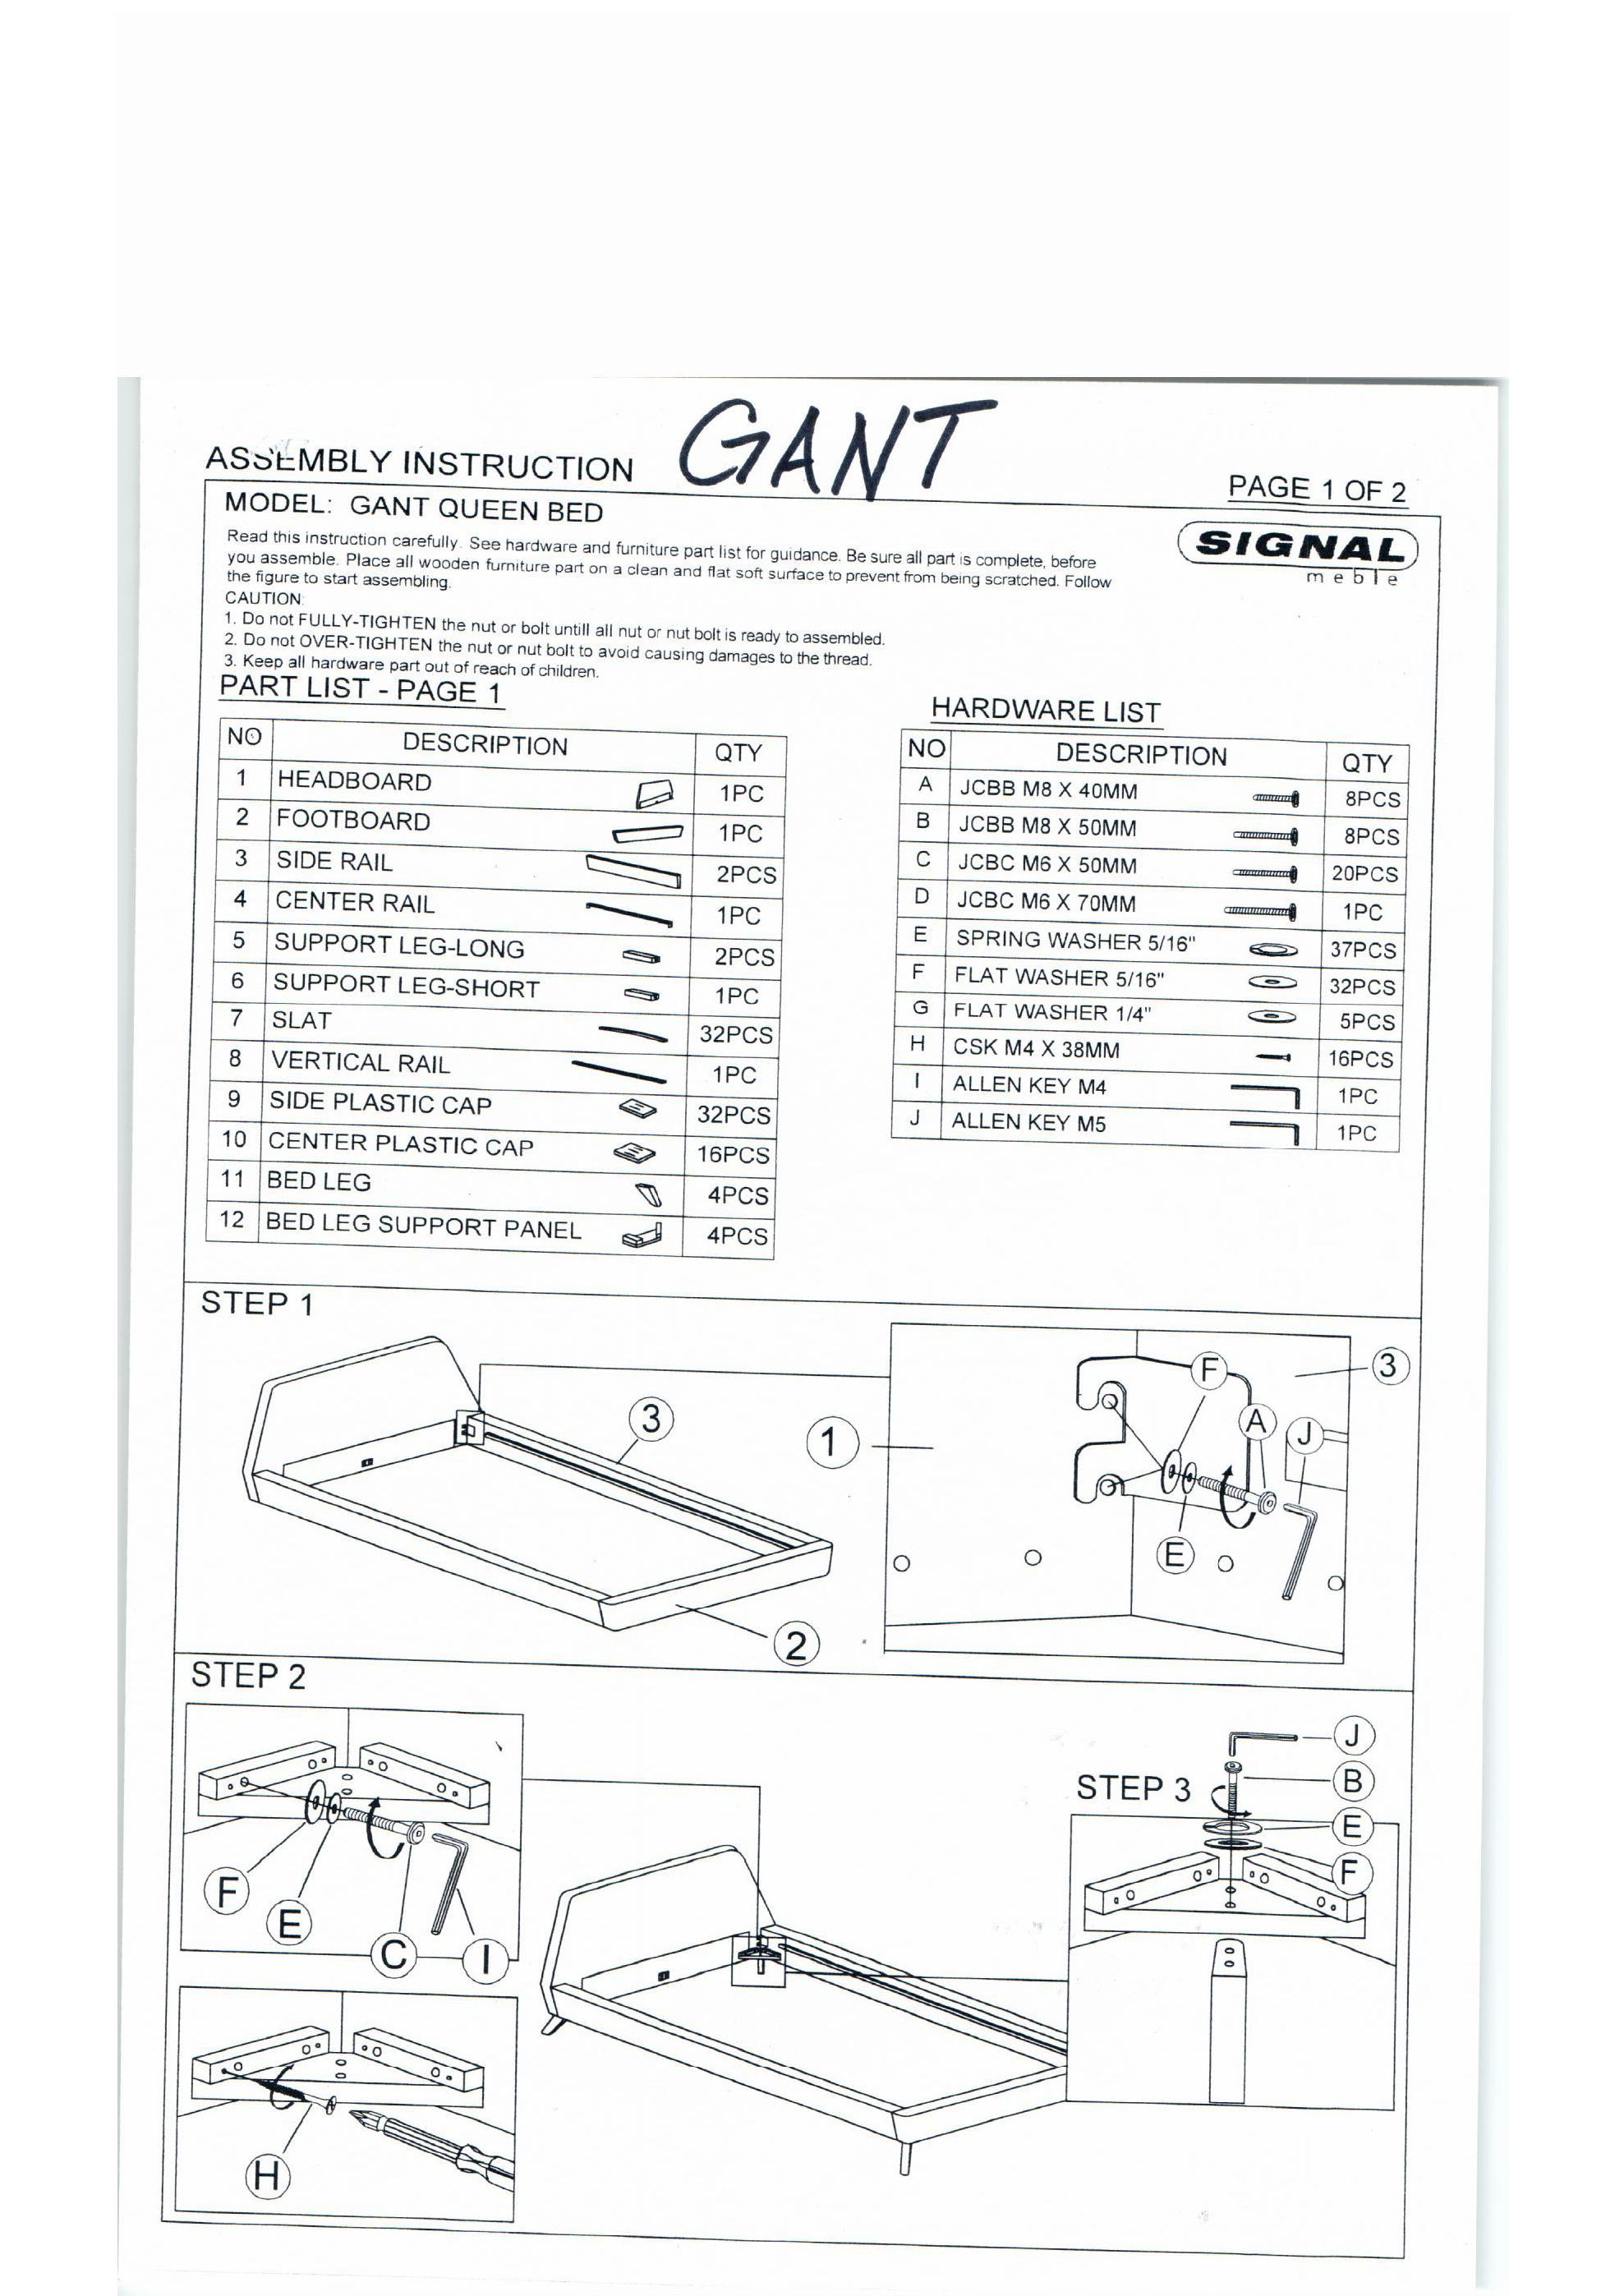 Gant_Stránka_1